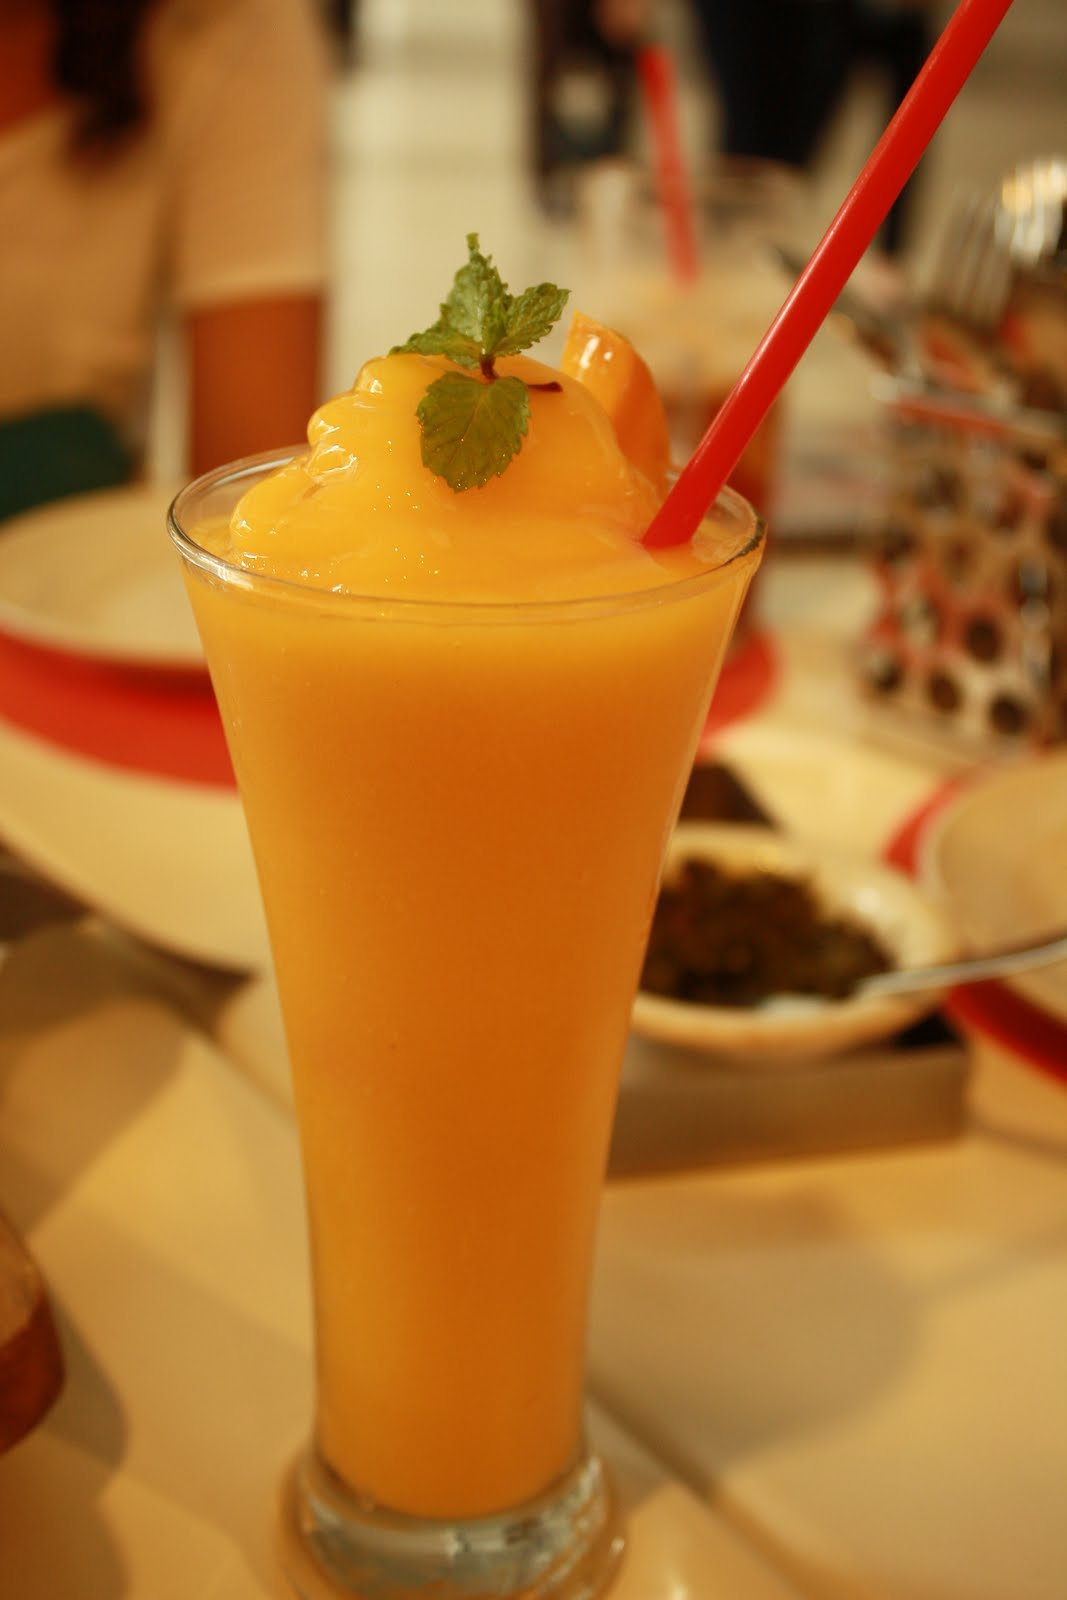 Mango maniax - hit the floor